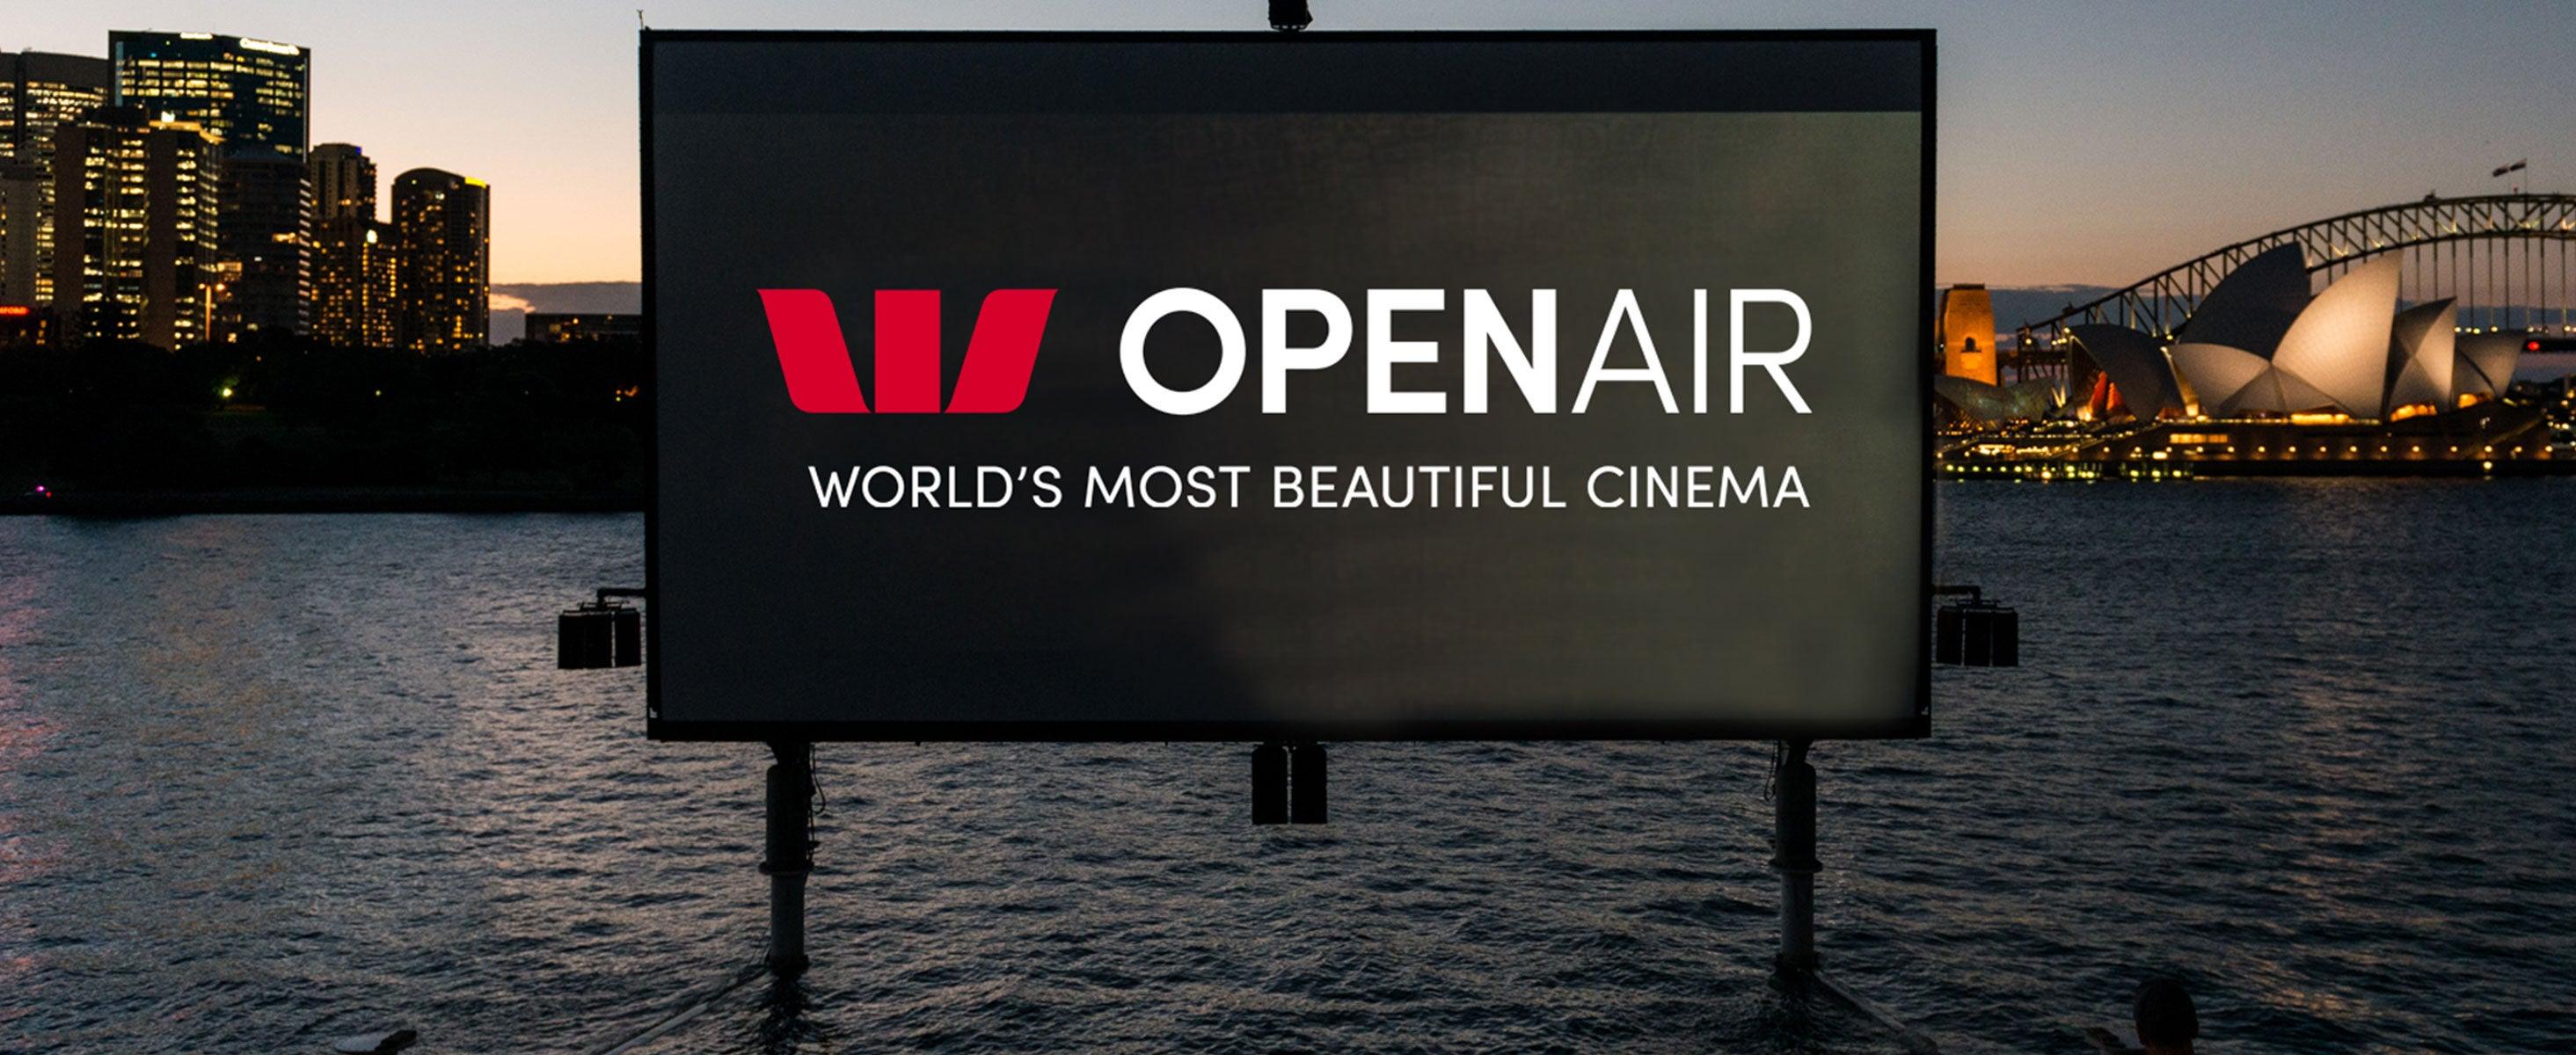 THE WORLDS MOST BEAUTIFUL CINEMA